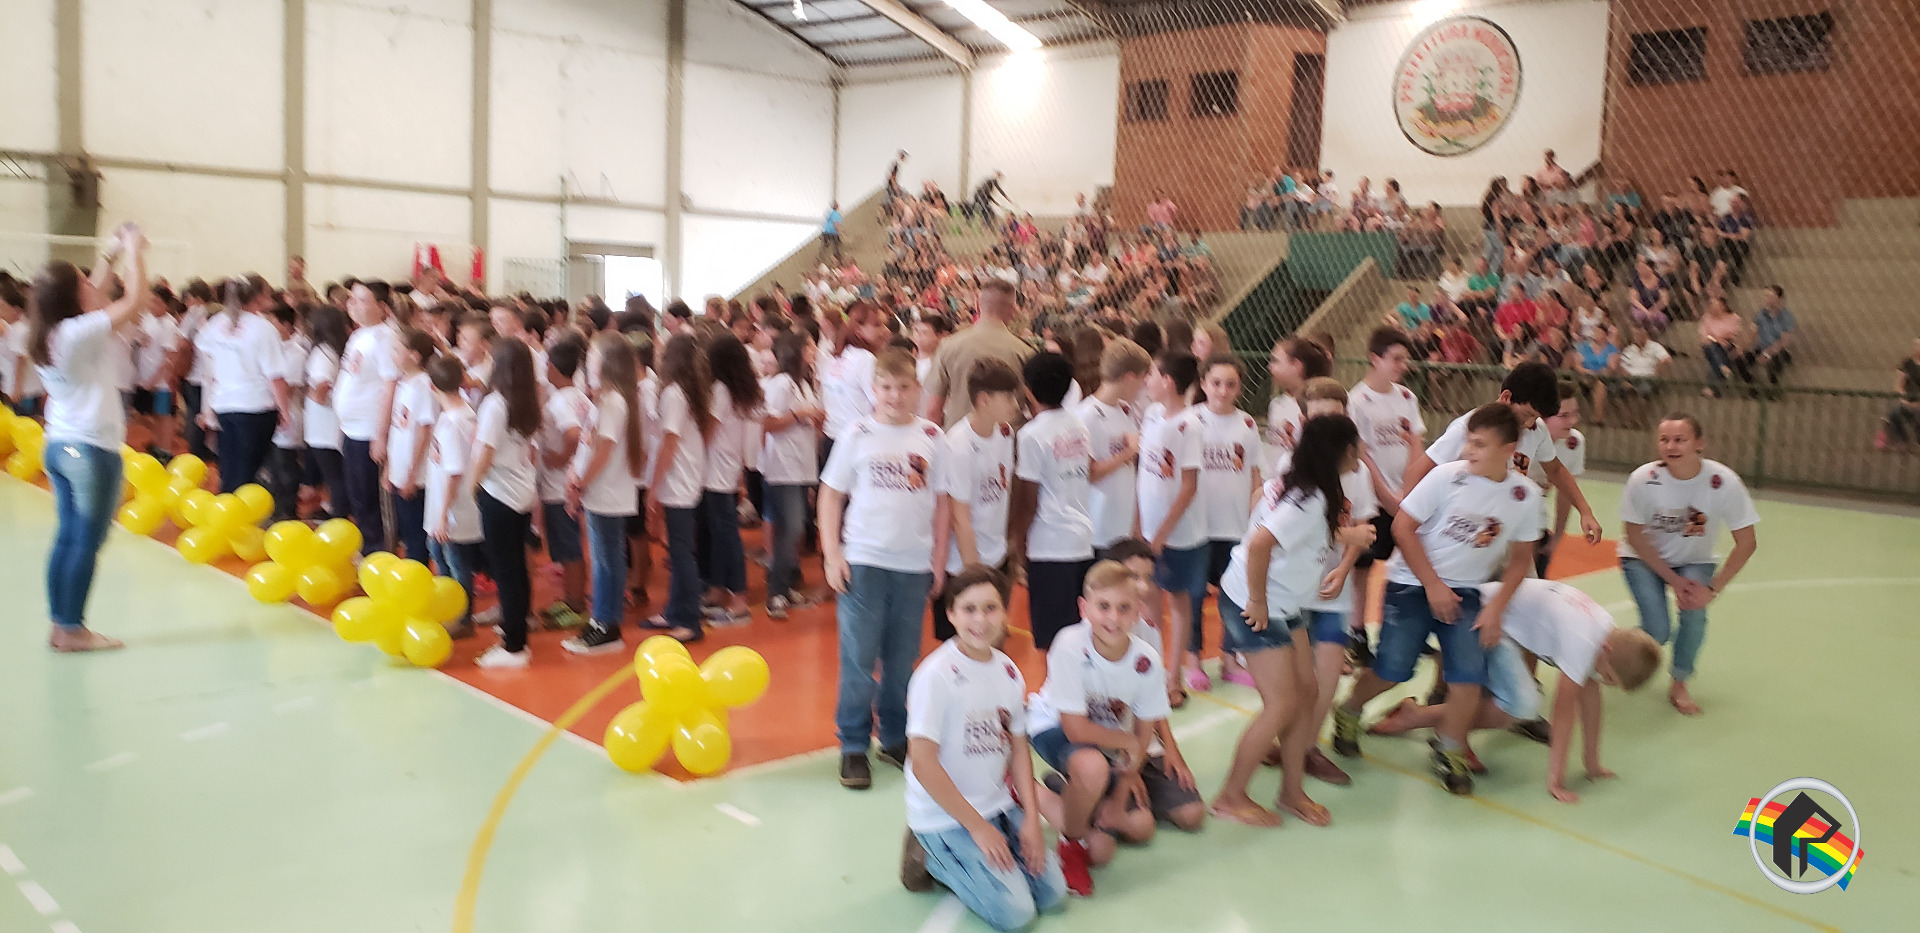 Proerd forma 210 alunos em Itapiranga